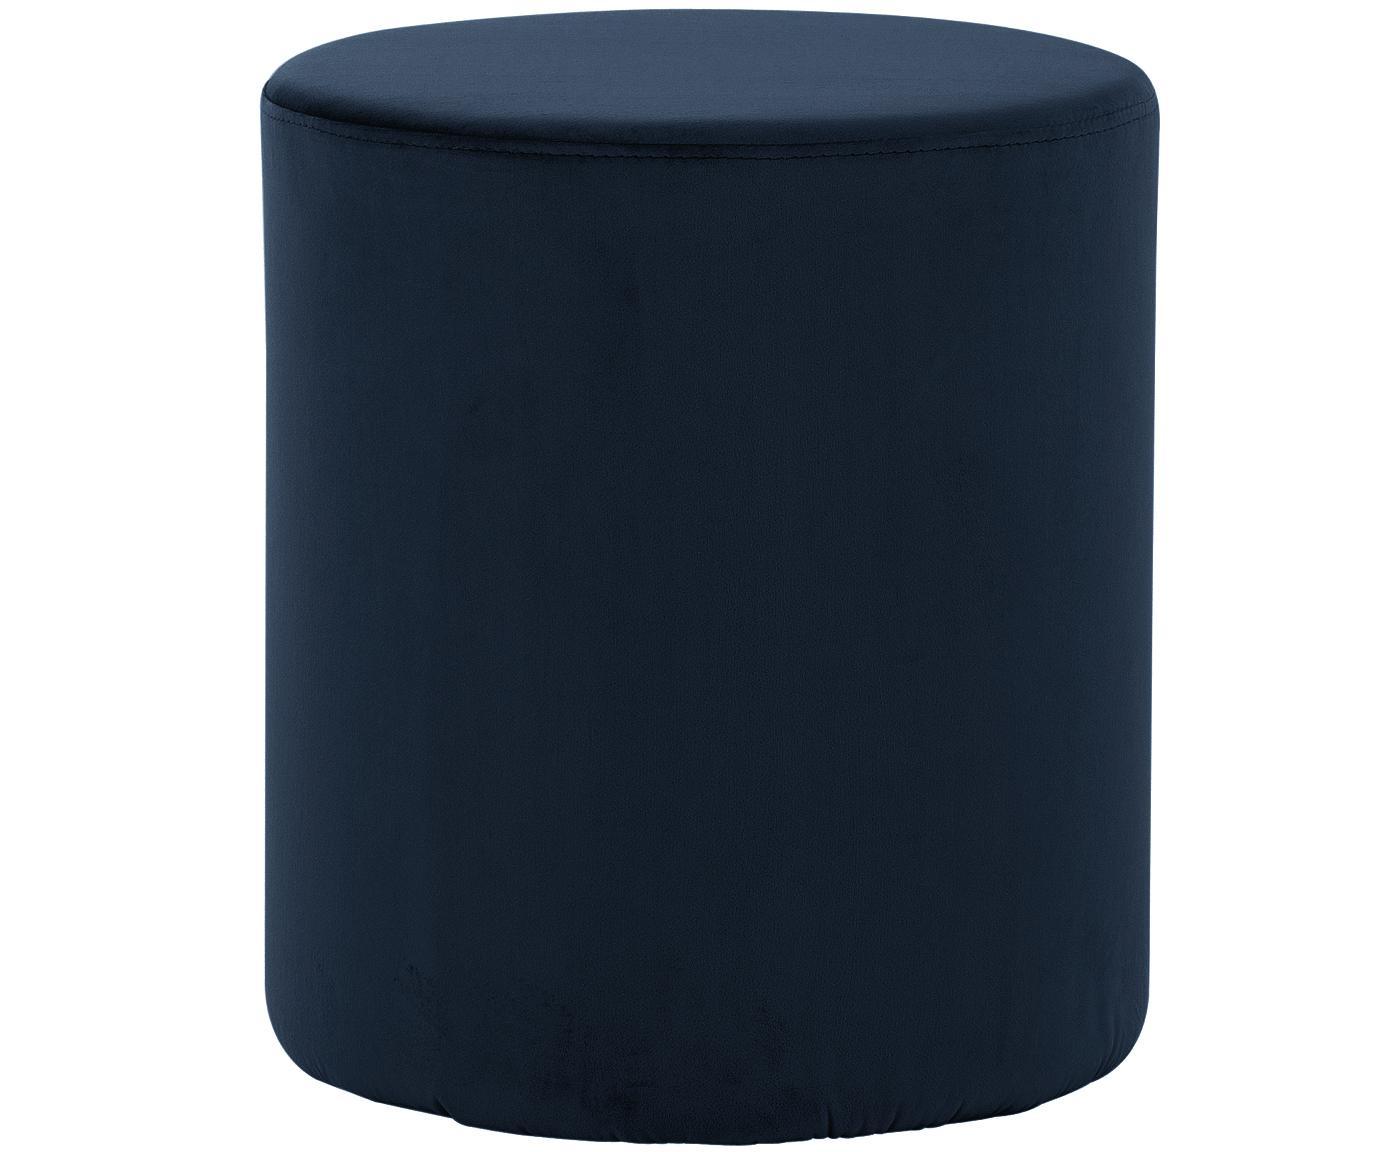 Fluwelen poef Daisy, Bekleding: fluweel (polyester), Frame: MDF, Marineblauw, Ø 40 x H 46 cm